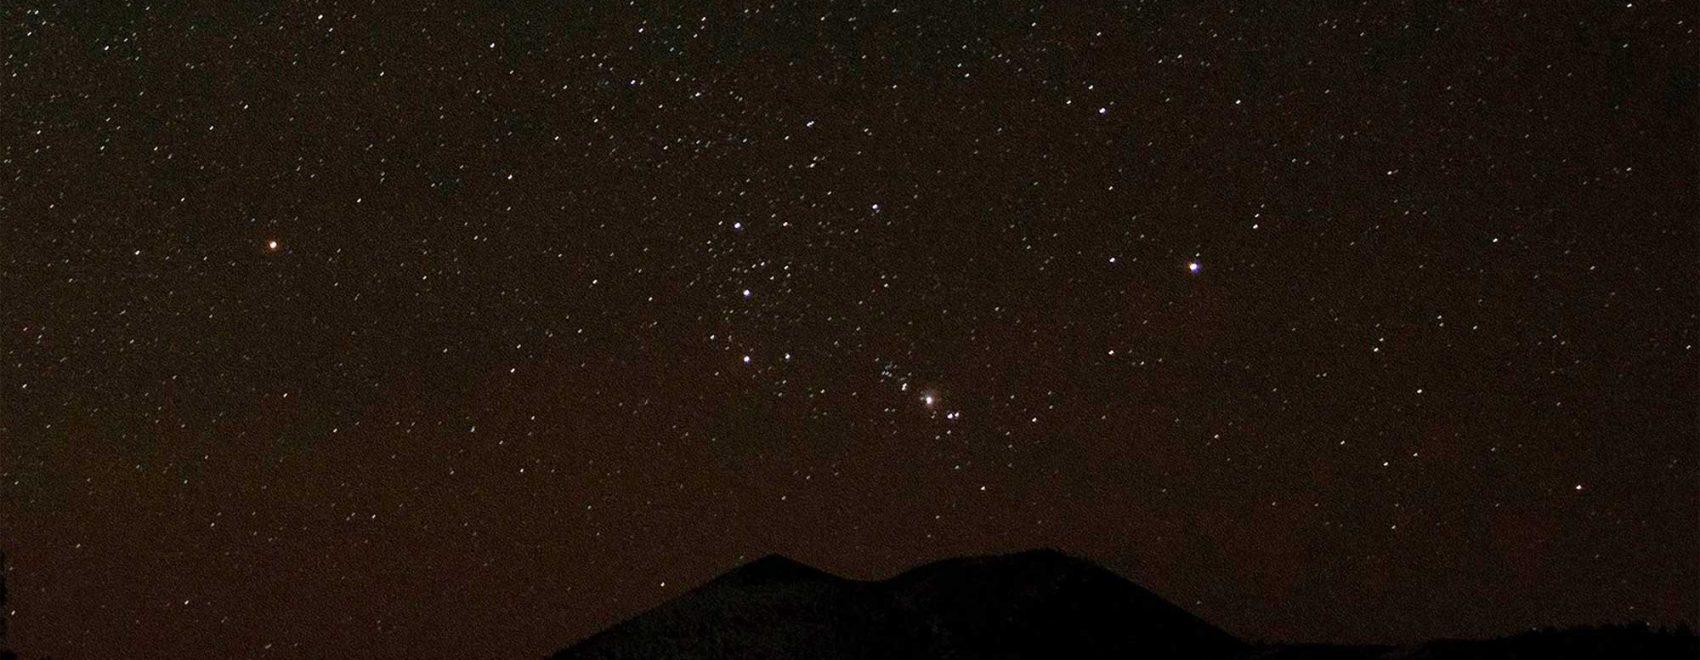 Sunset Crater Volcano Night Sky | NPS Photo by K. Ackerman